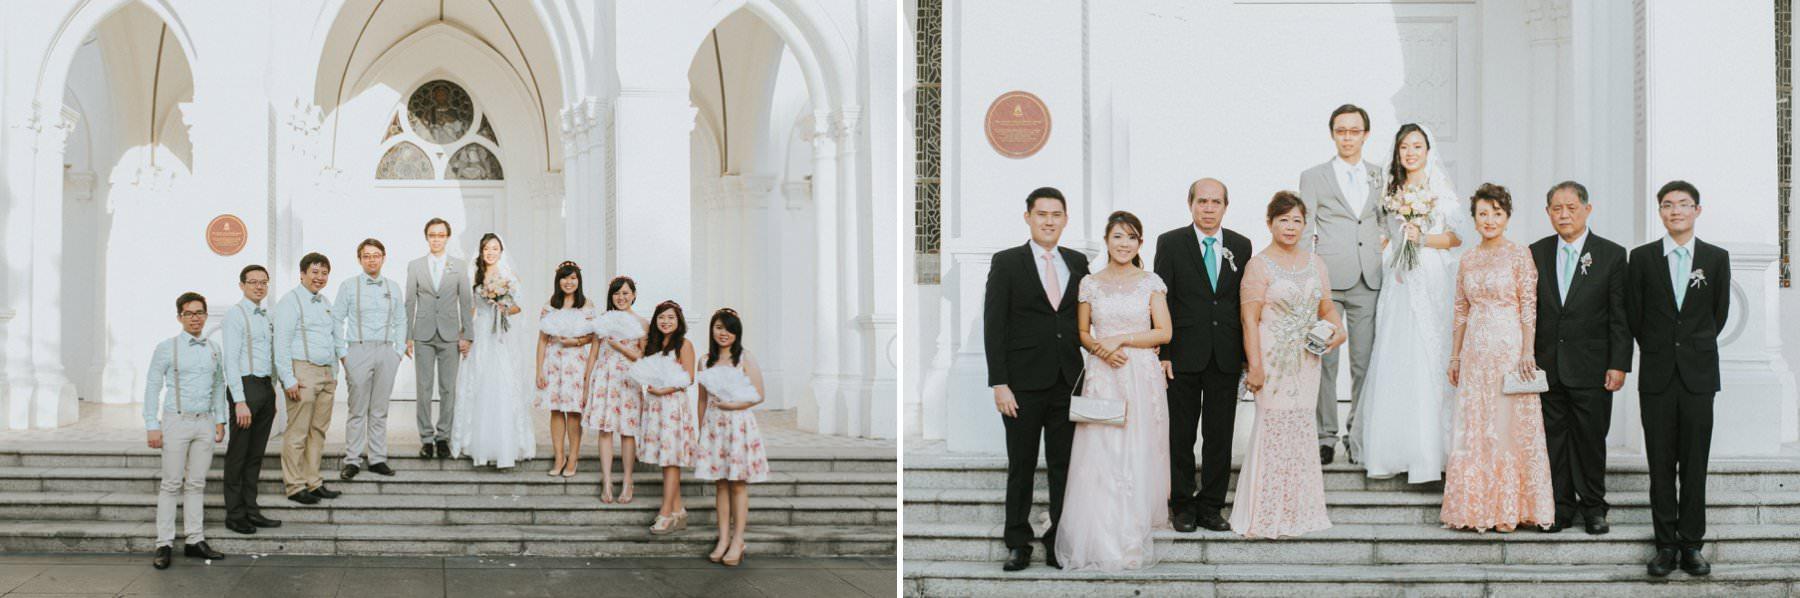 Singapore_Chijmes_Hall_Wedding_0046